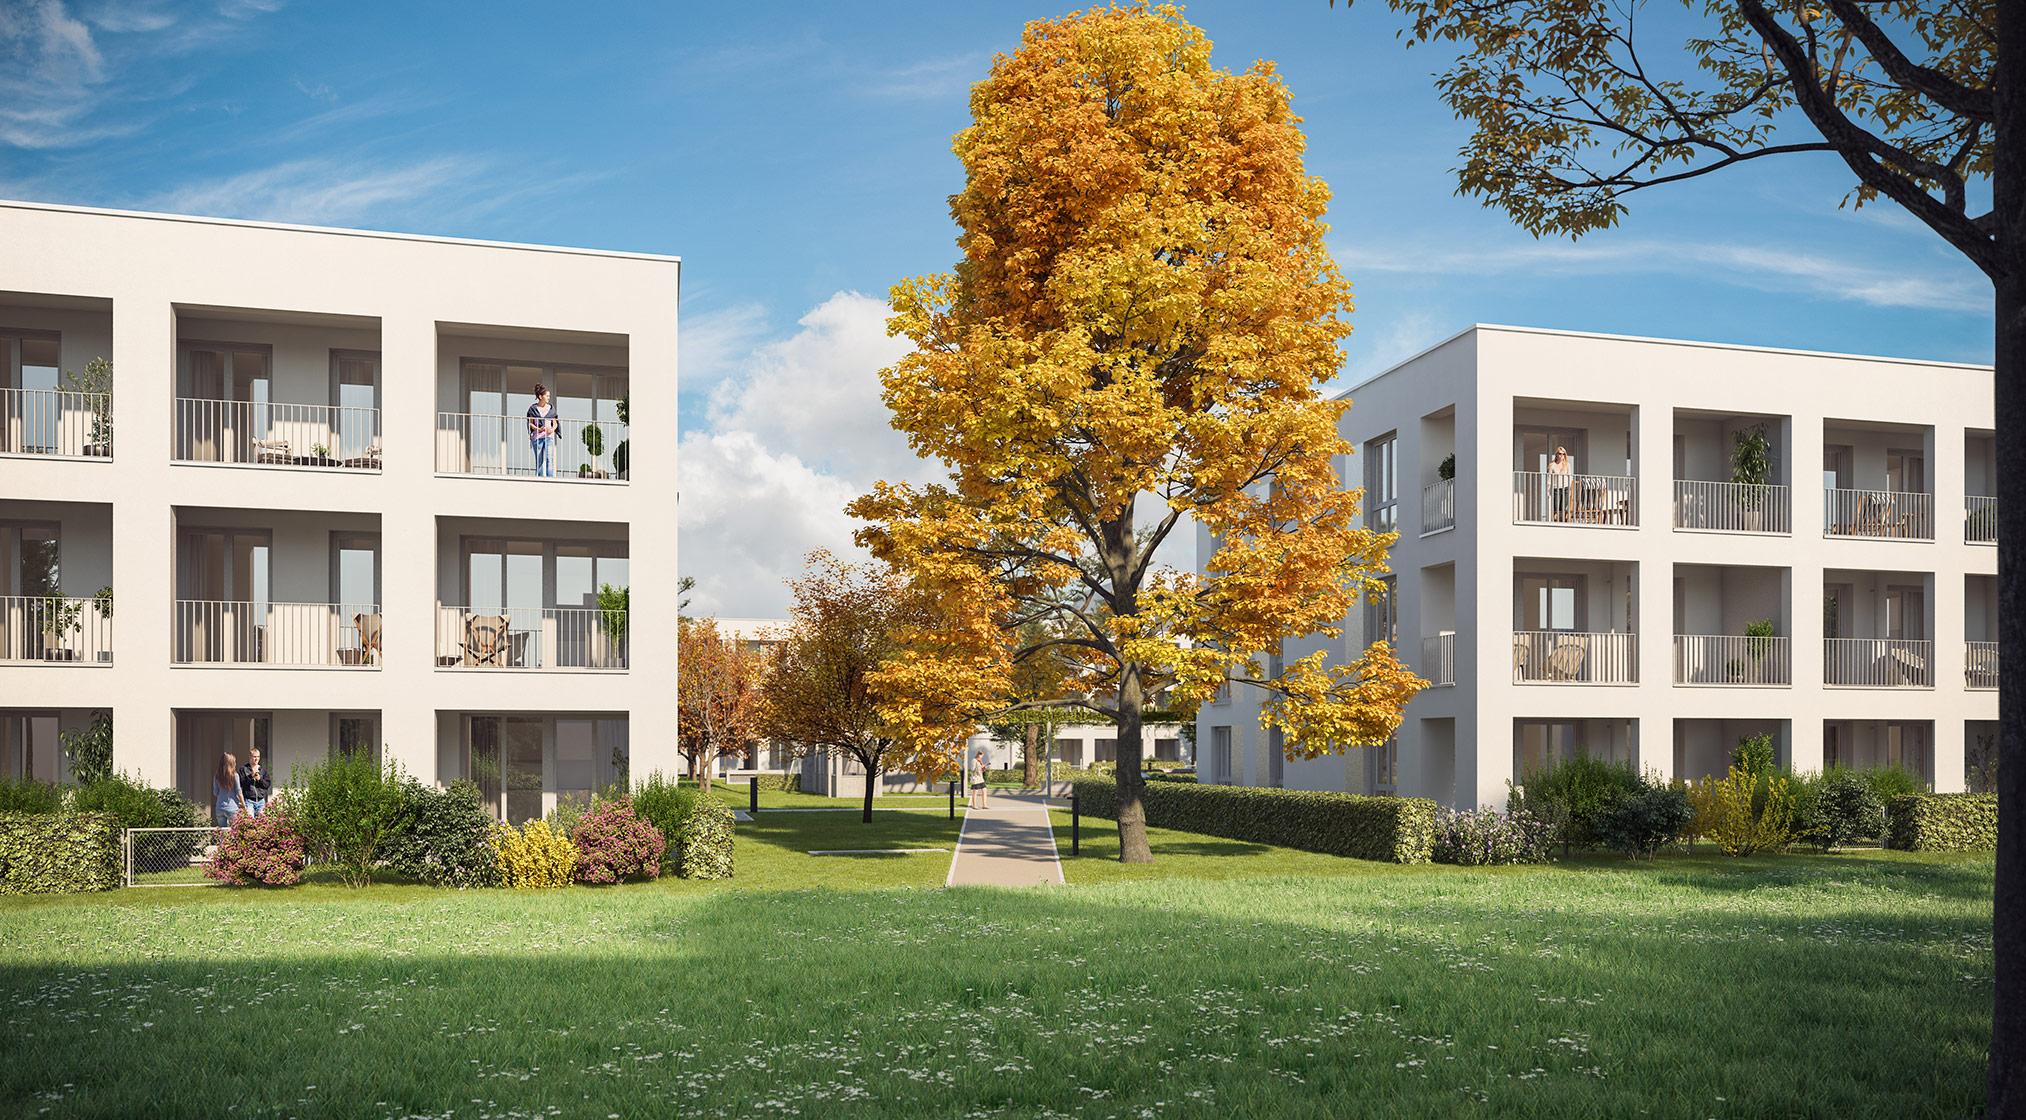 Eigentumswohnungen Kirchheim bei München: Grüne Mitte Kirchheim - Park-Carré - Projektdetails Illustration 3